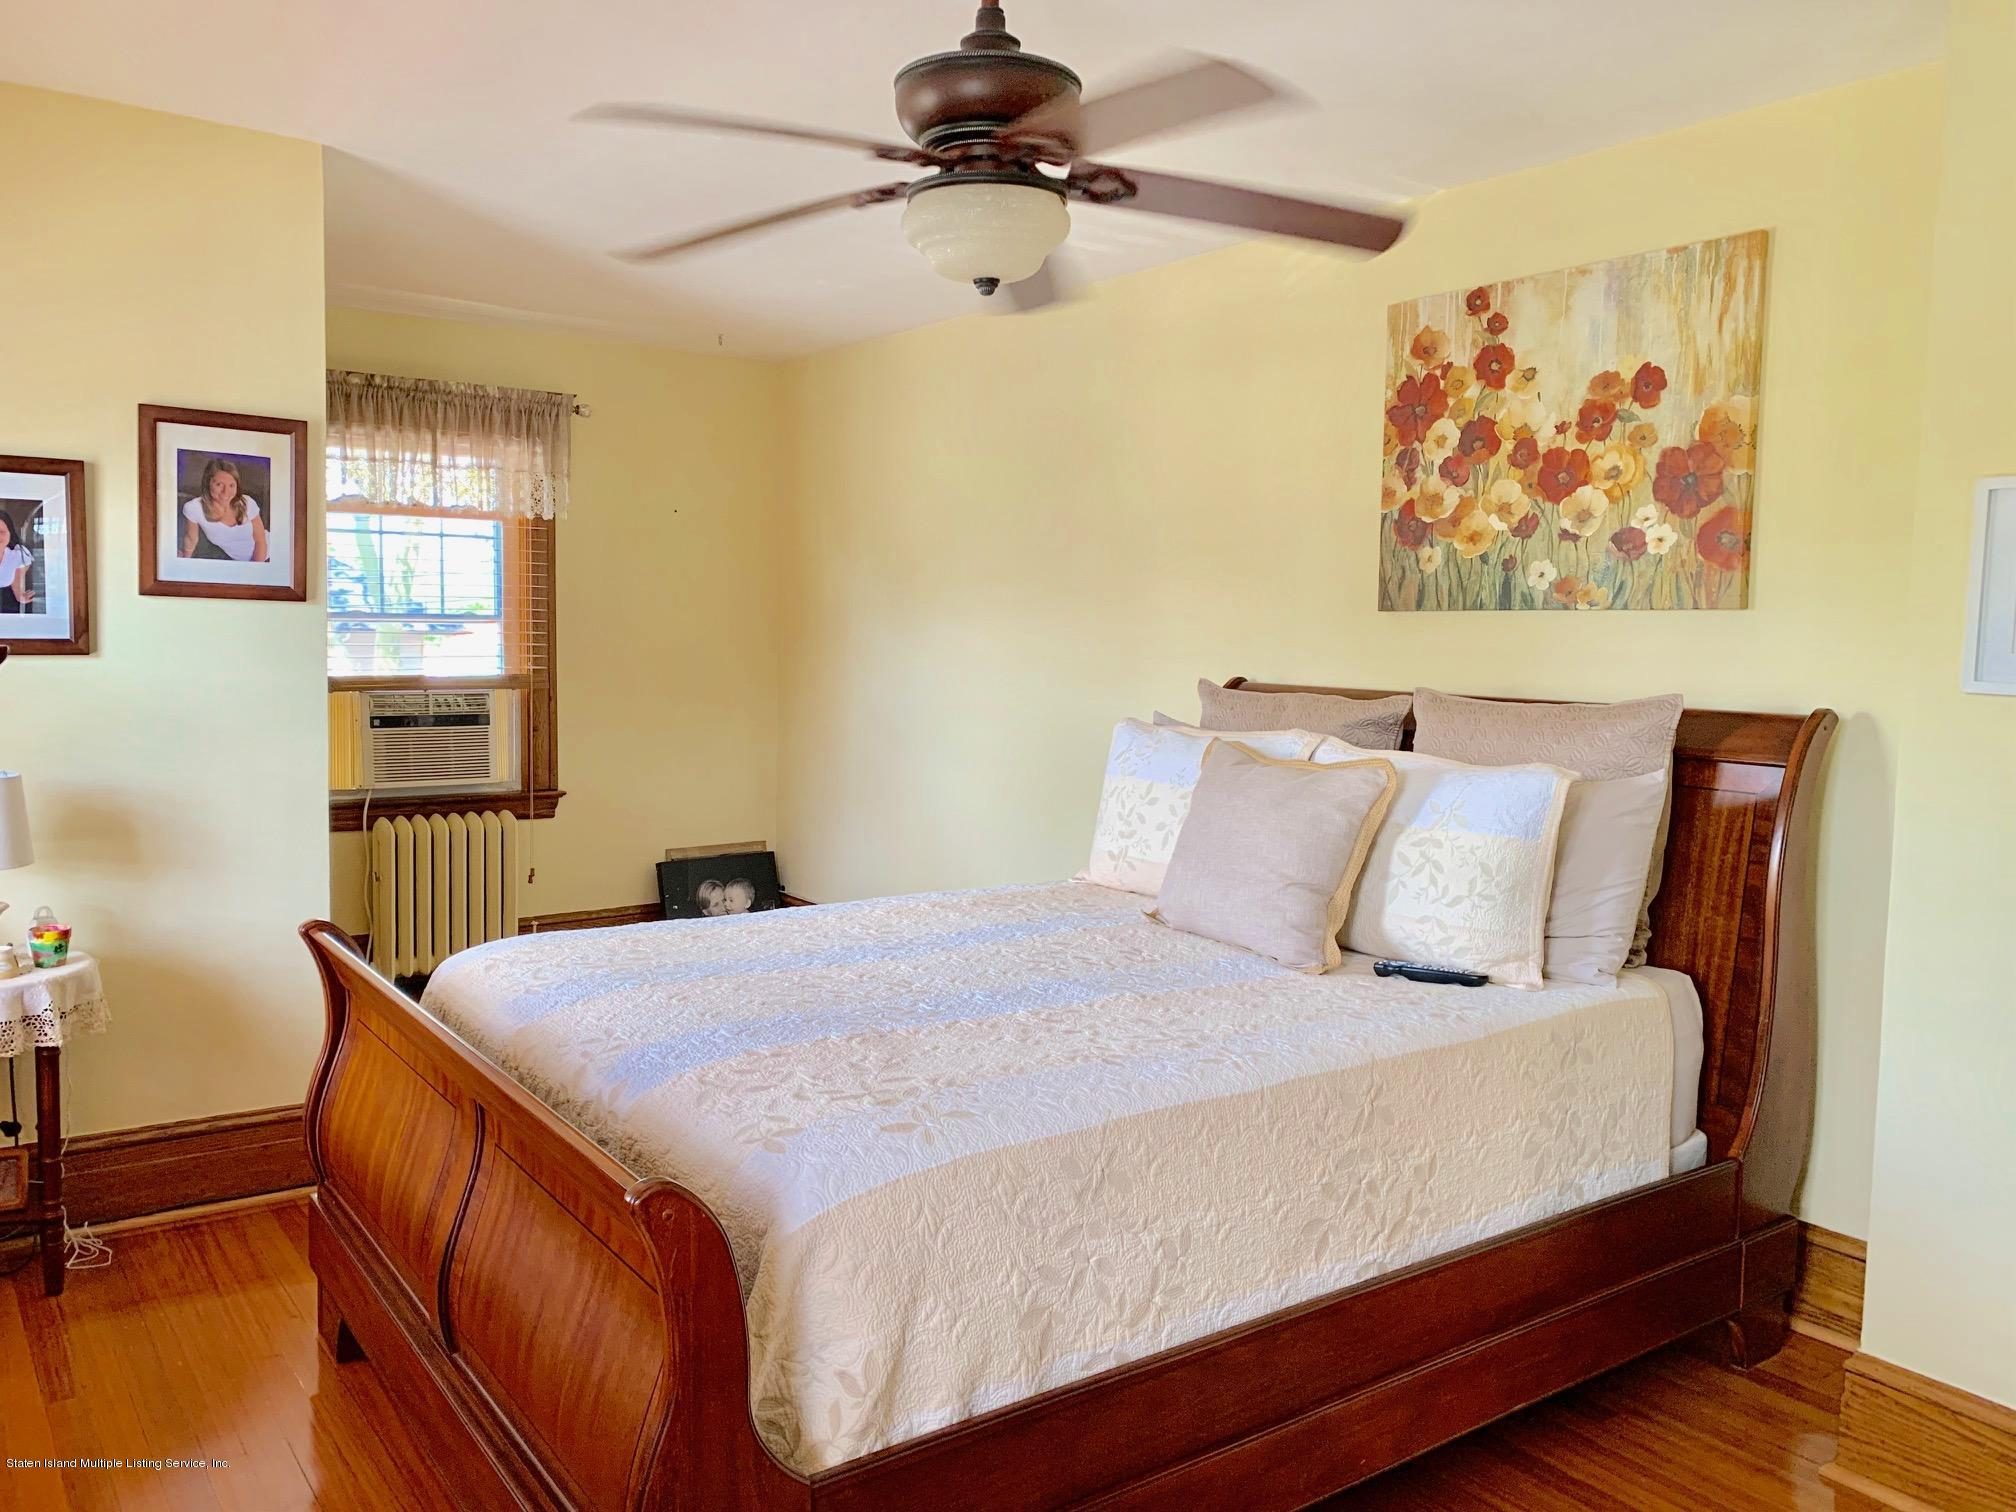 Single Family - Detached 195 Fairview Avenue  Staten Island, NY 10314, MLS-1132423-24